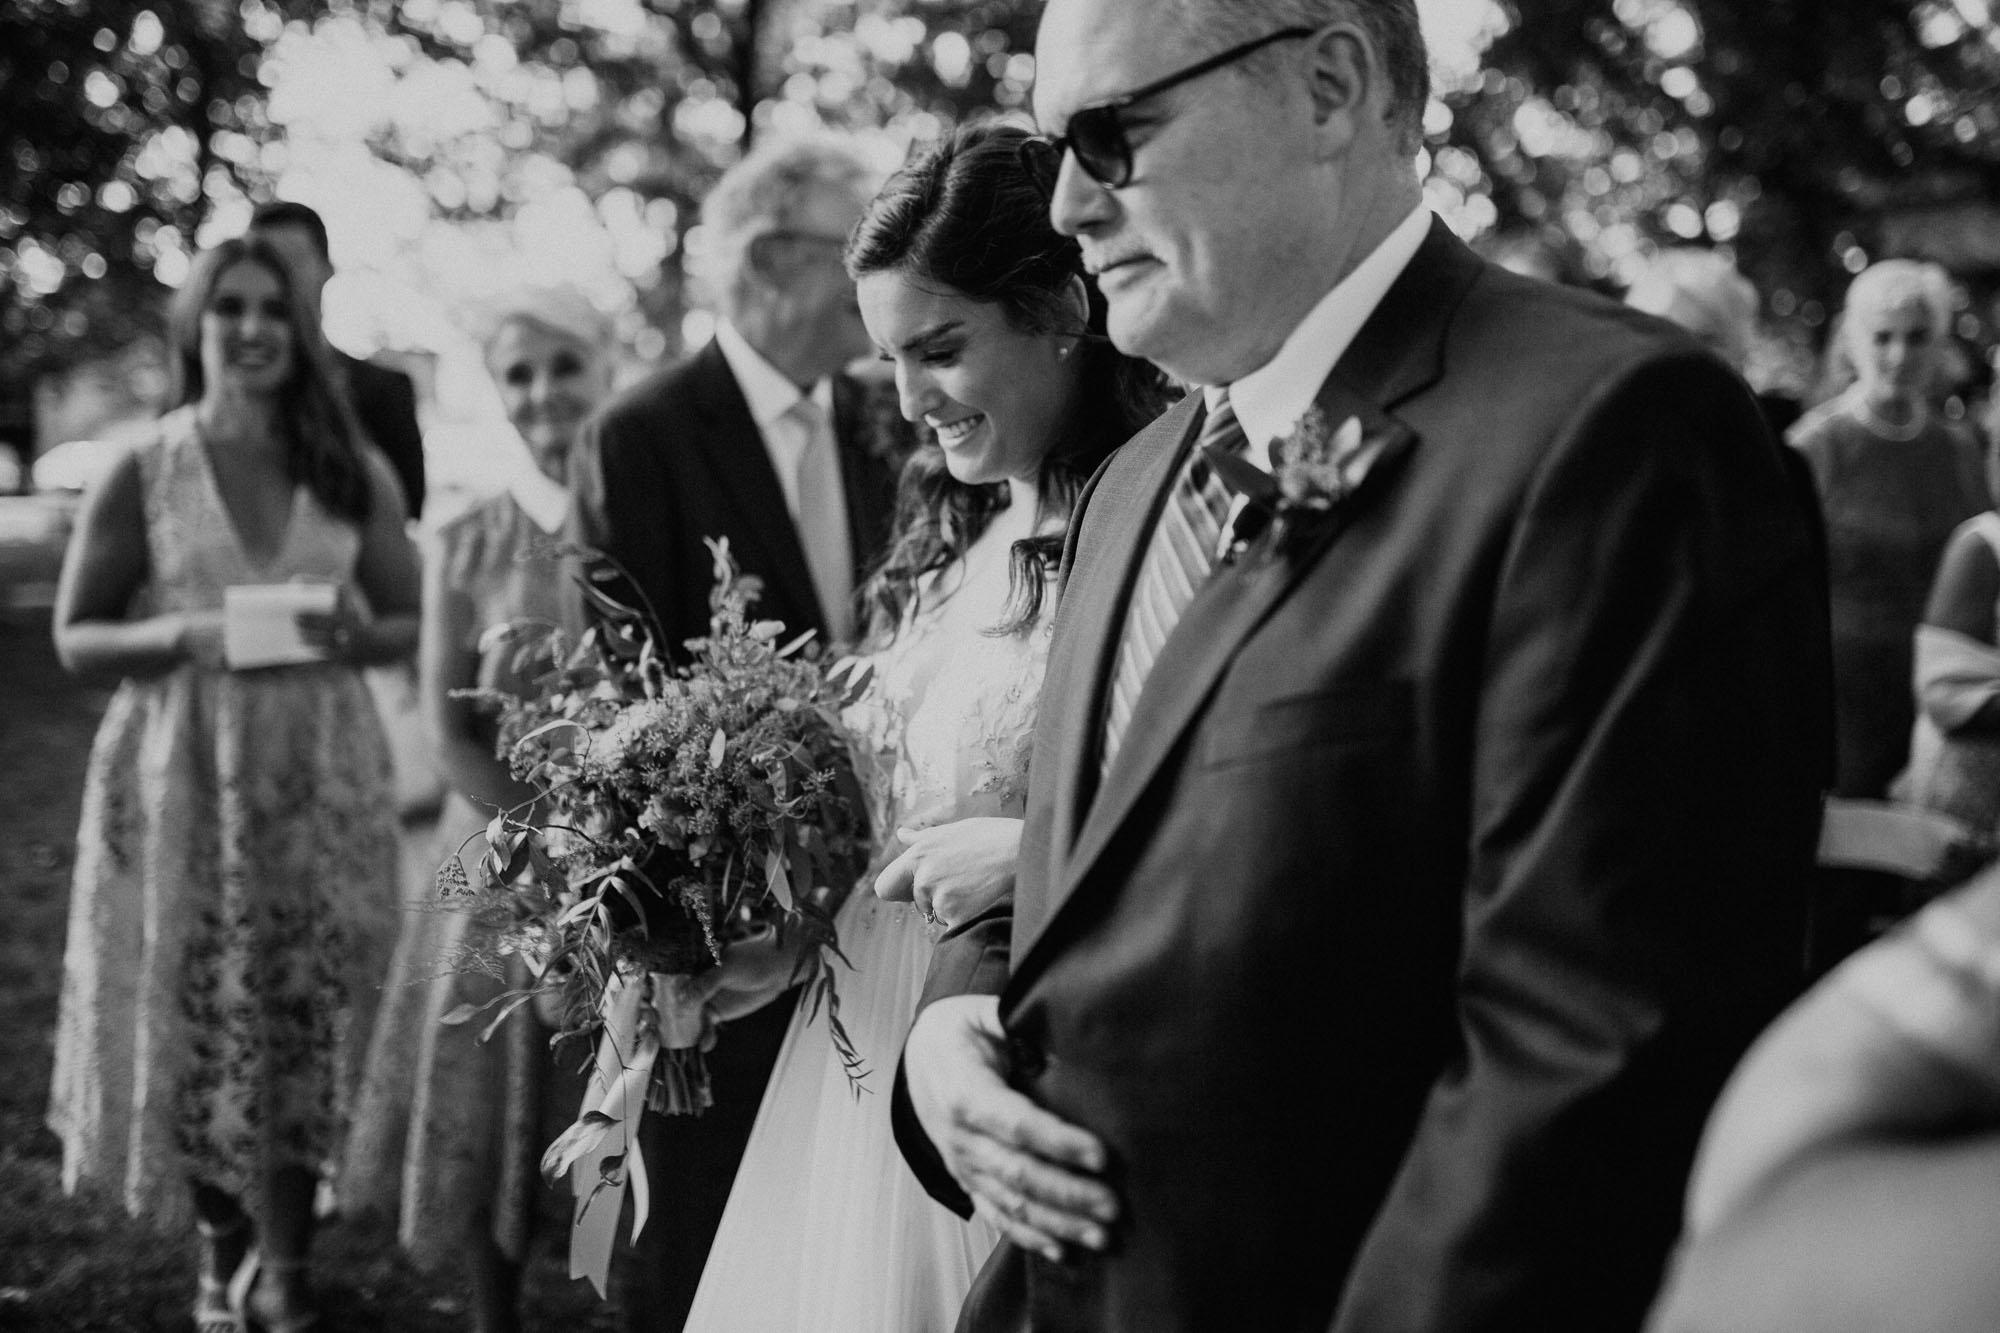 journeyman_distillery_wedding_photographer_chicago_il_wright_photographs-3758.jpg